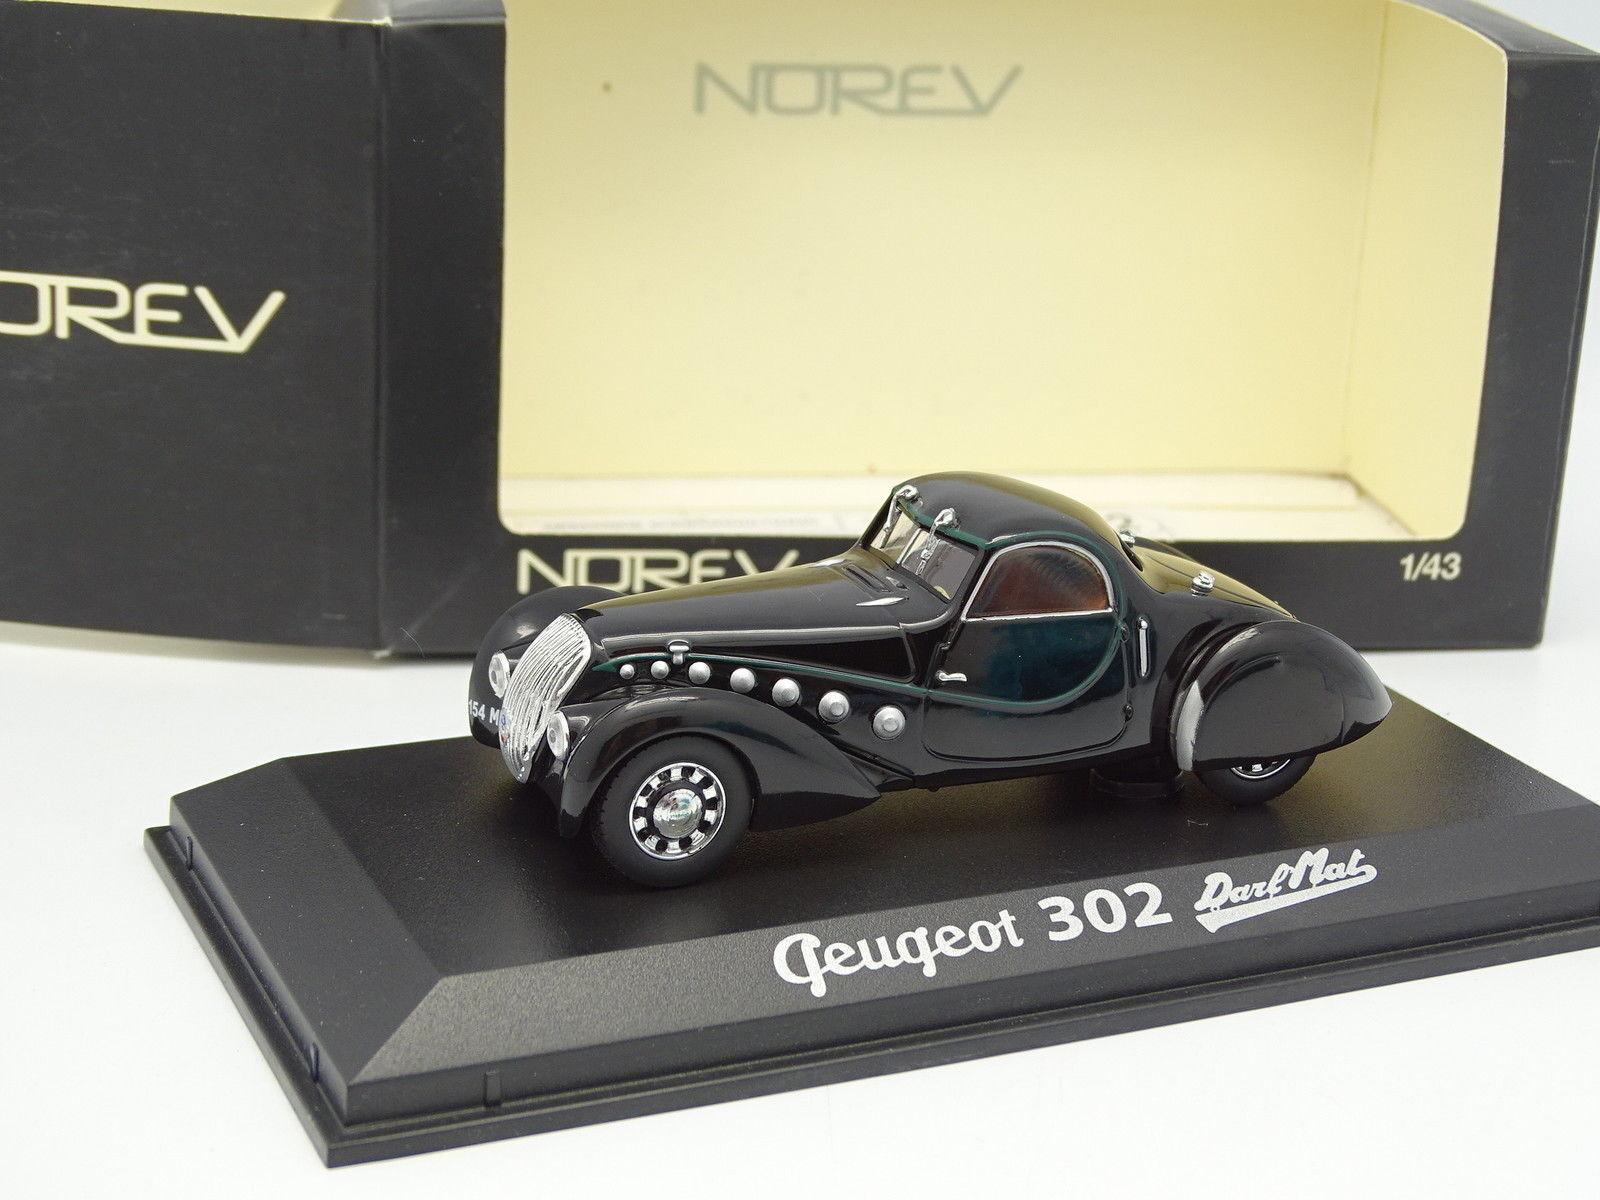 Garantía 100% de ajuste Norev 1 43 - Peugeot 302 Darl Darl Darl Mate Negra  moda clasica